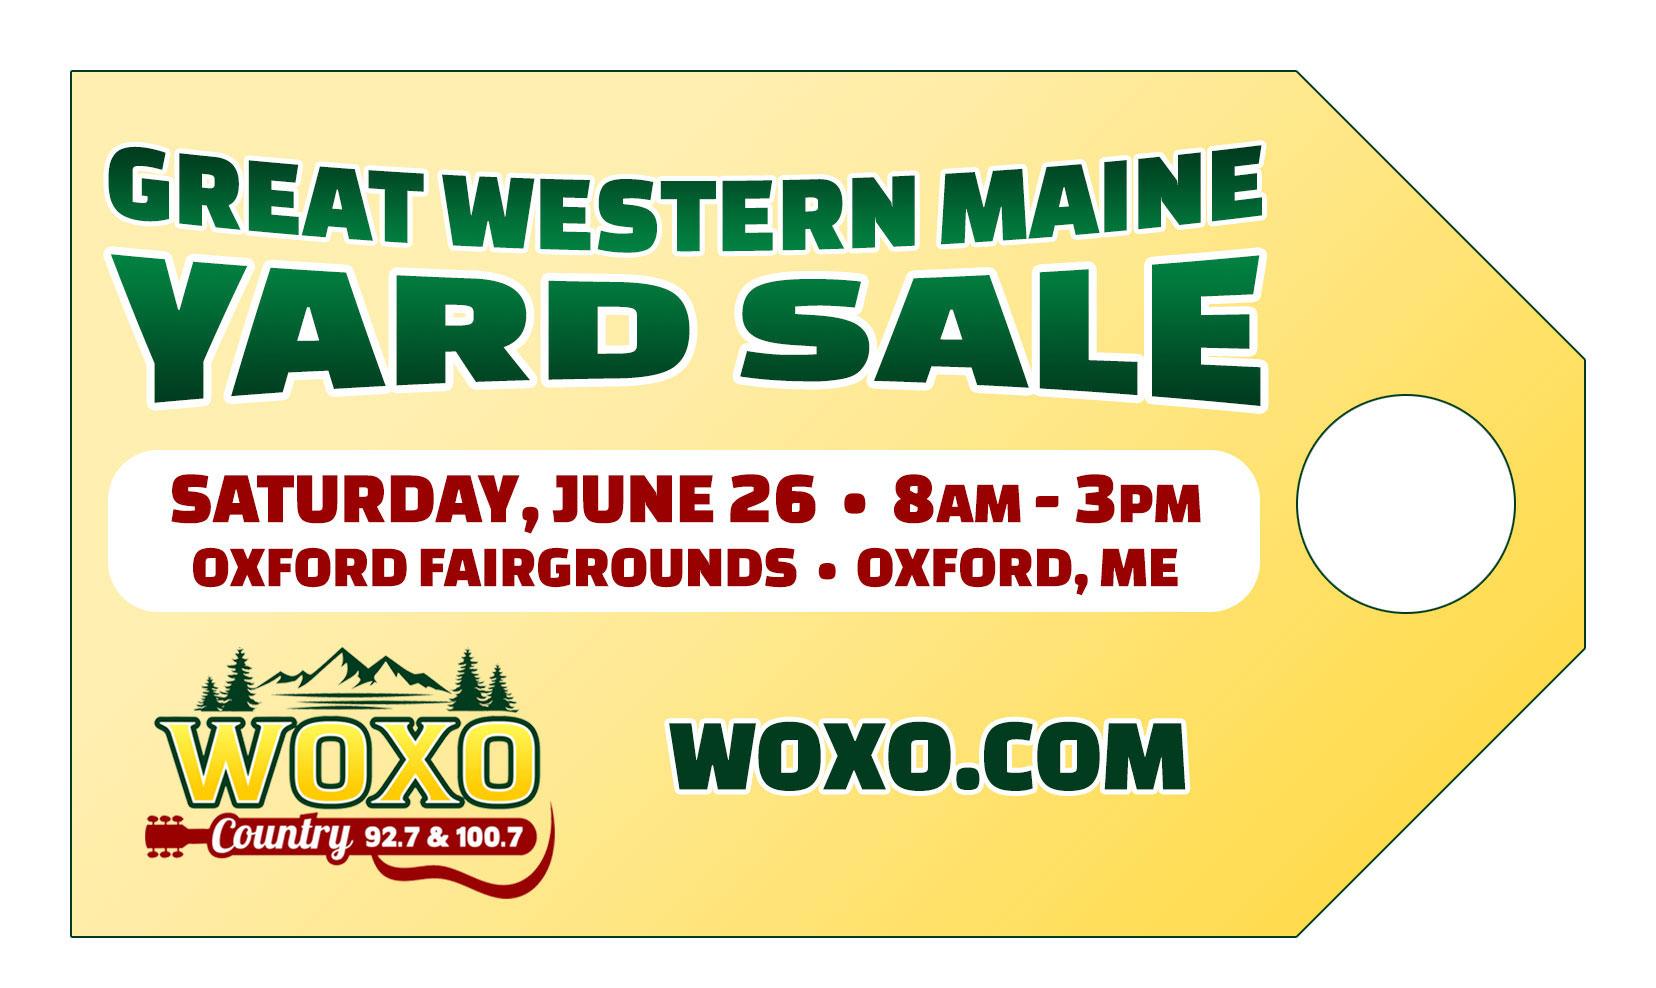 Great Western Maine Yard Sale